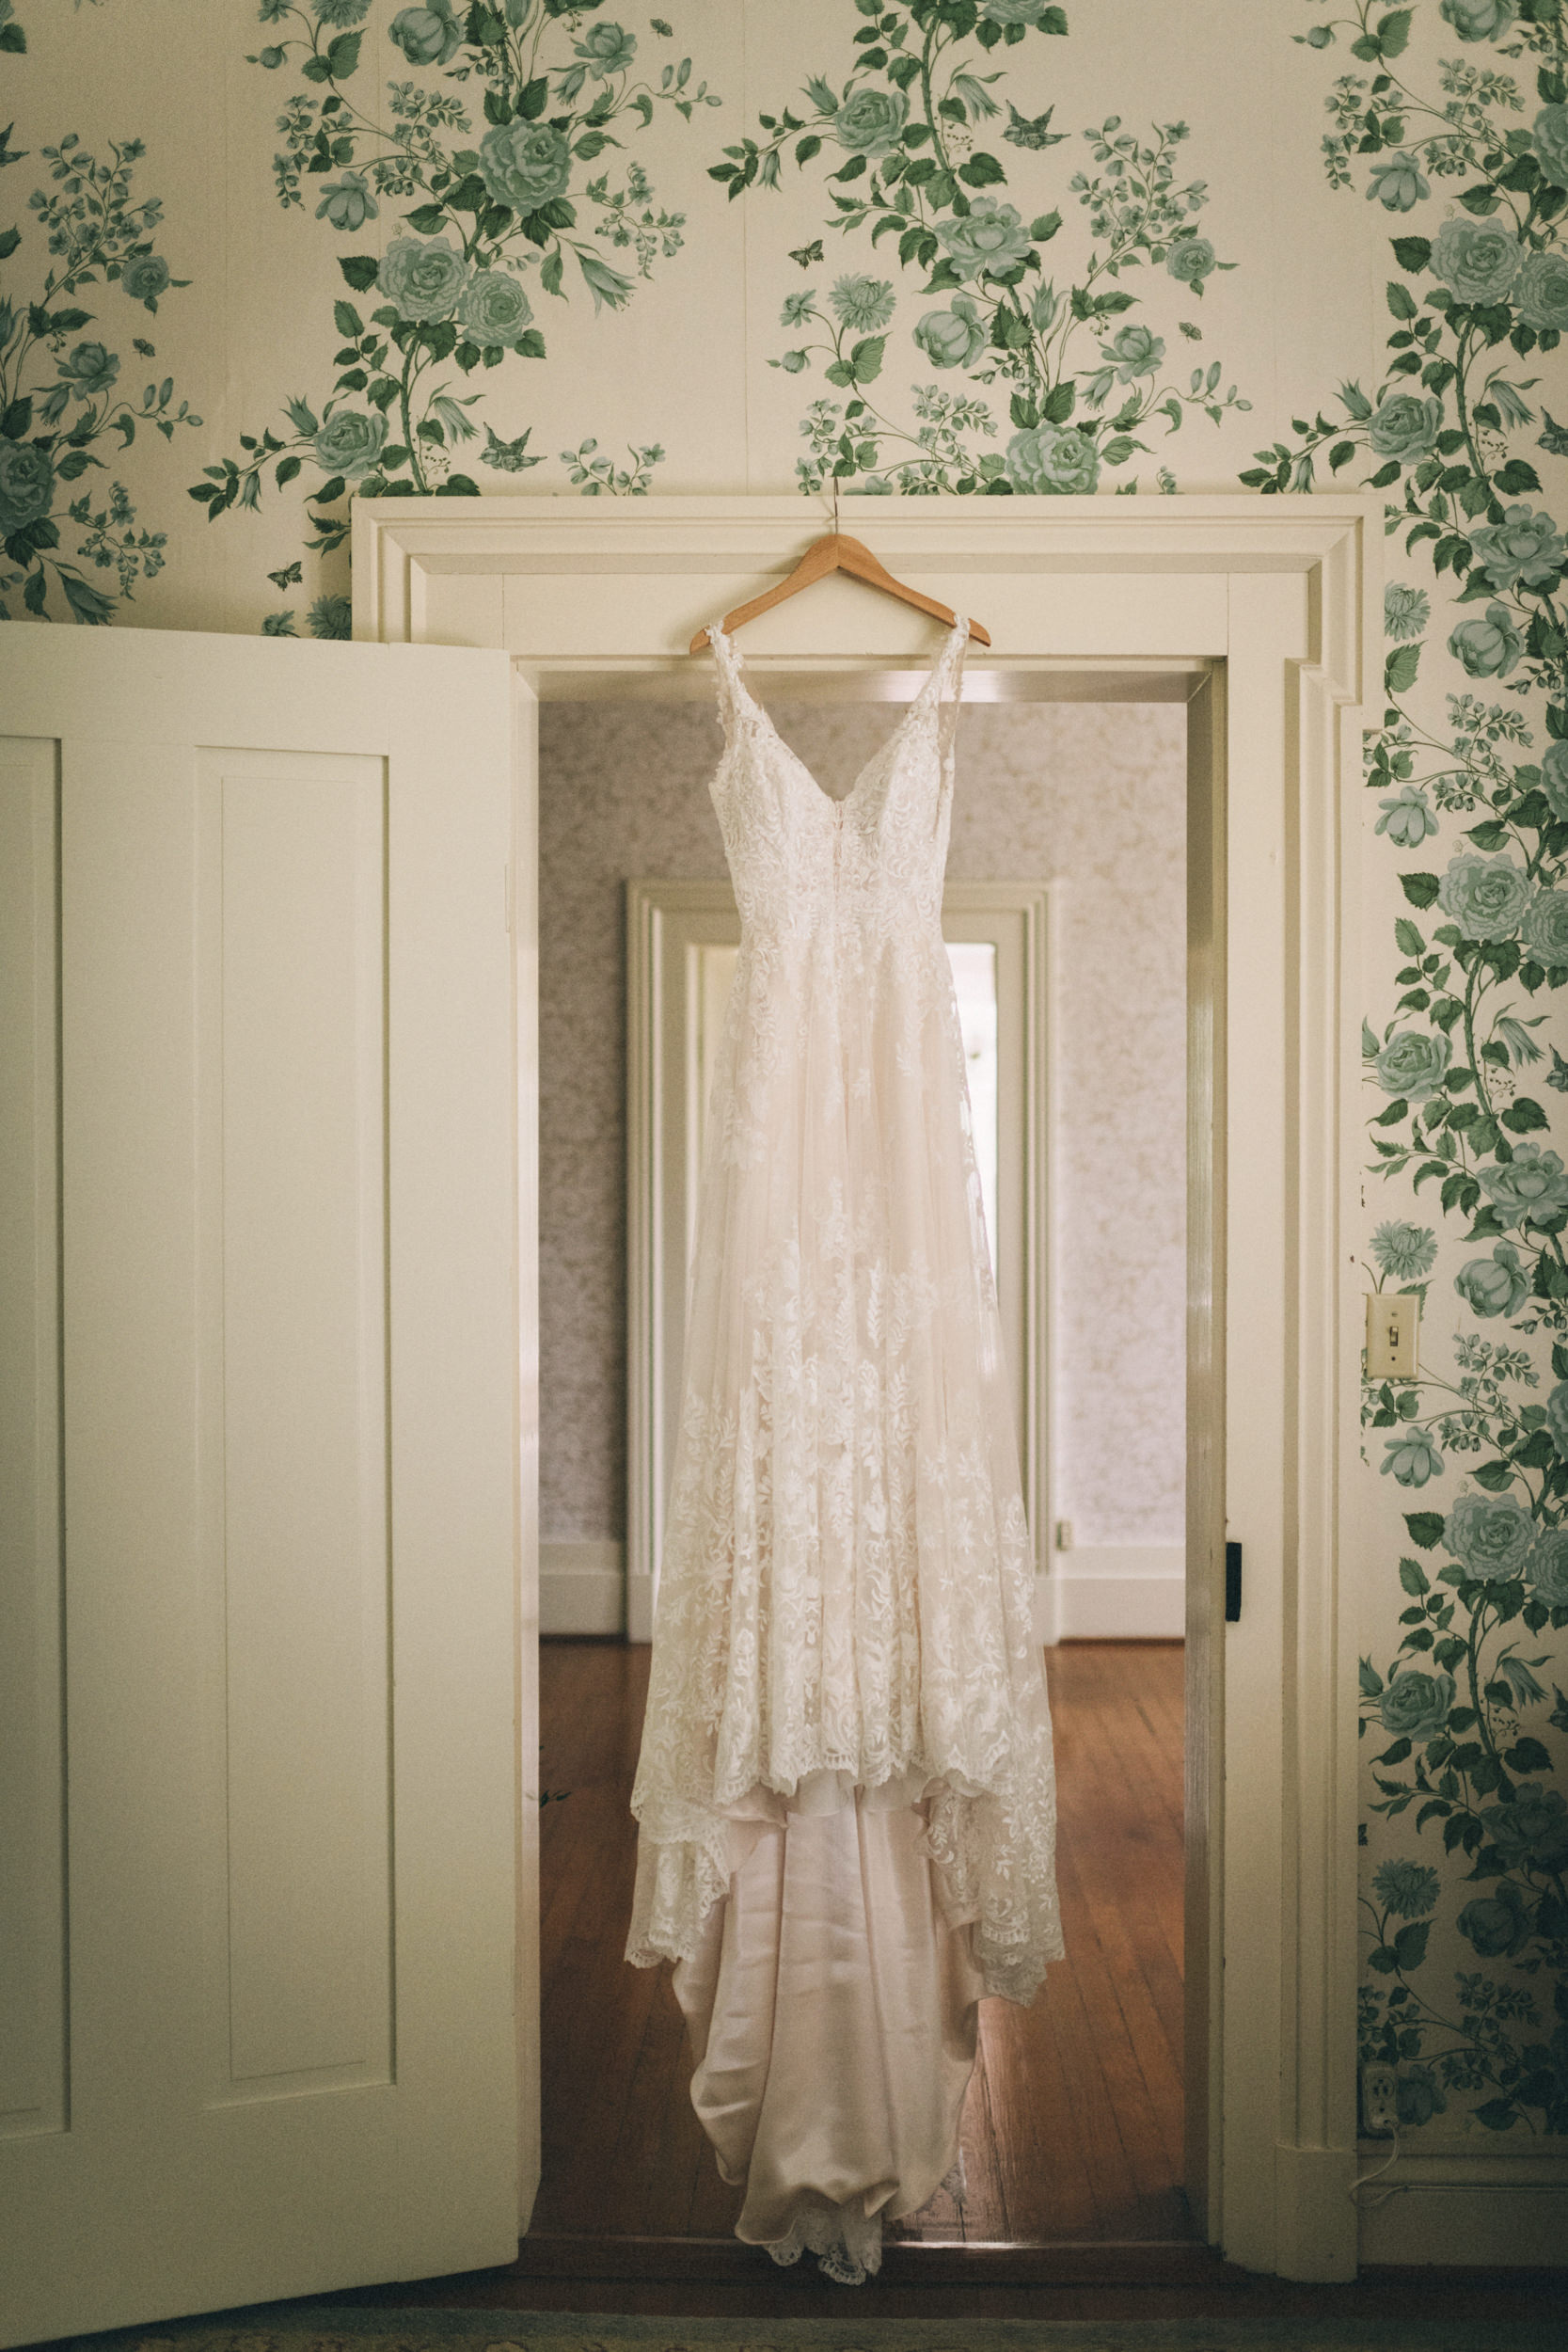 Louisville-Kentucky-Wedding-and-Elopement-Photographer-Sarah-Katherine-Davis-Photography-Summer-Jewel-Toned-Wedding-Chineese-Tea-Ceremony-Warrenwood-Manor-Danville-27.jpg